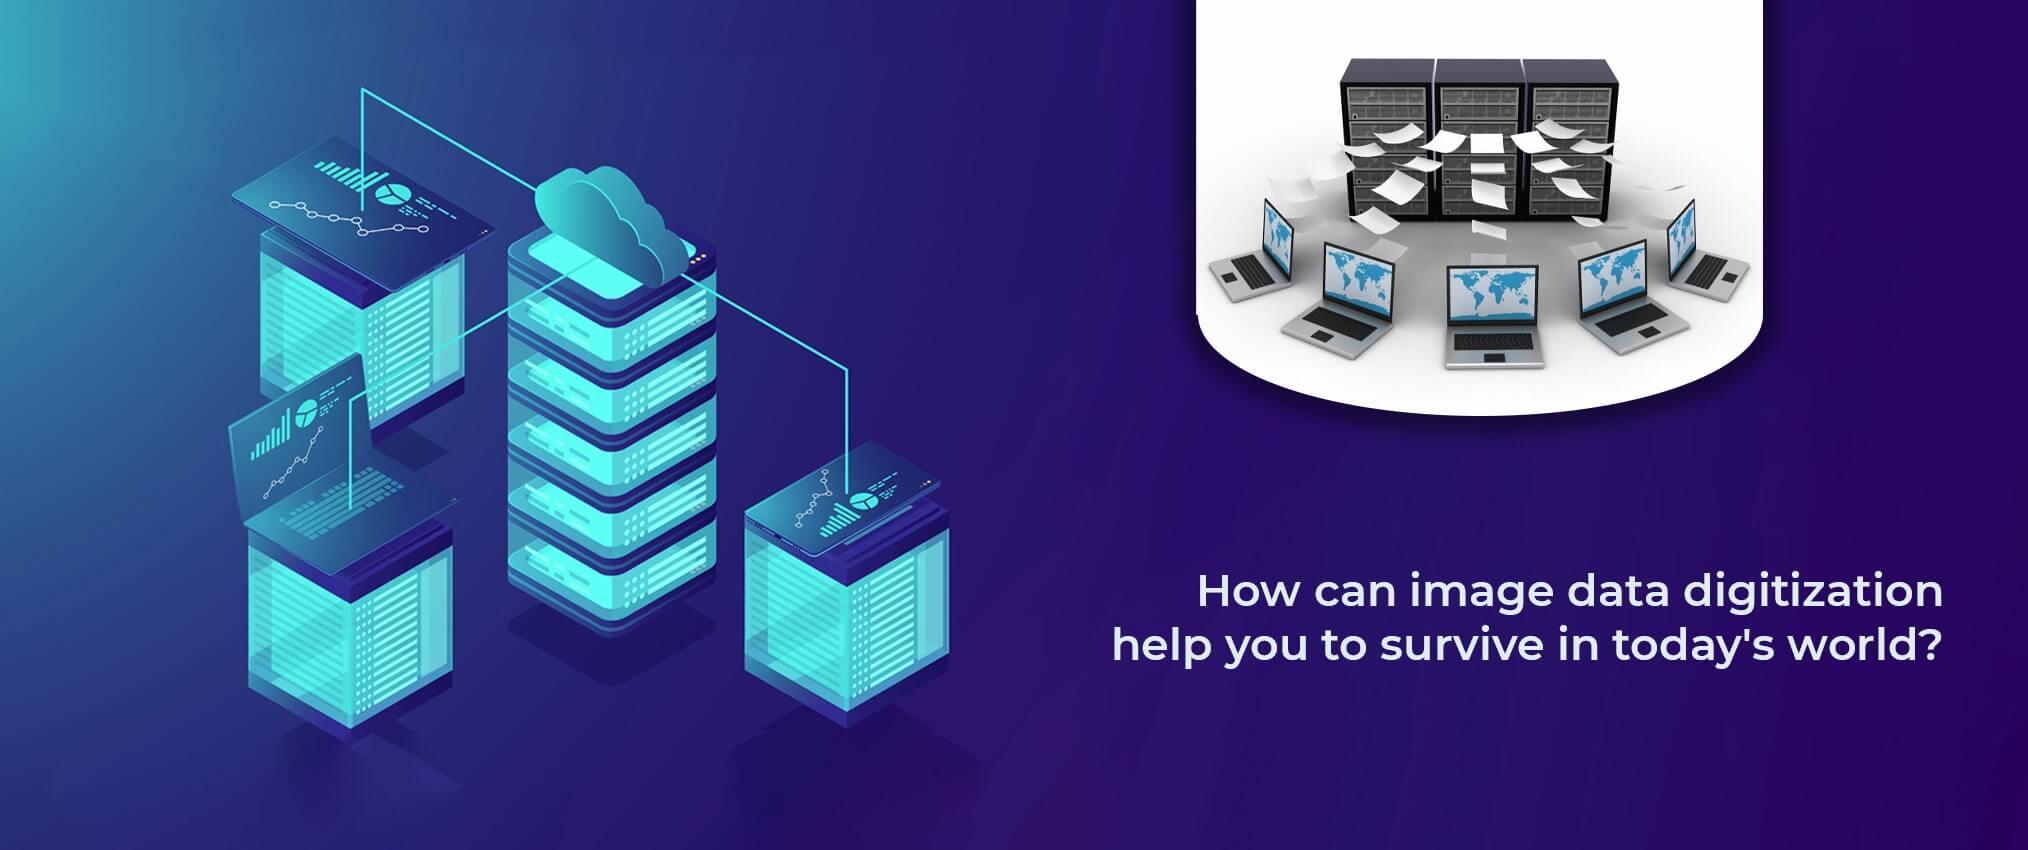 image digitization service